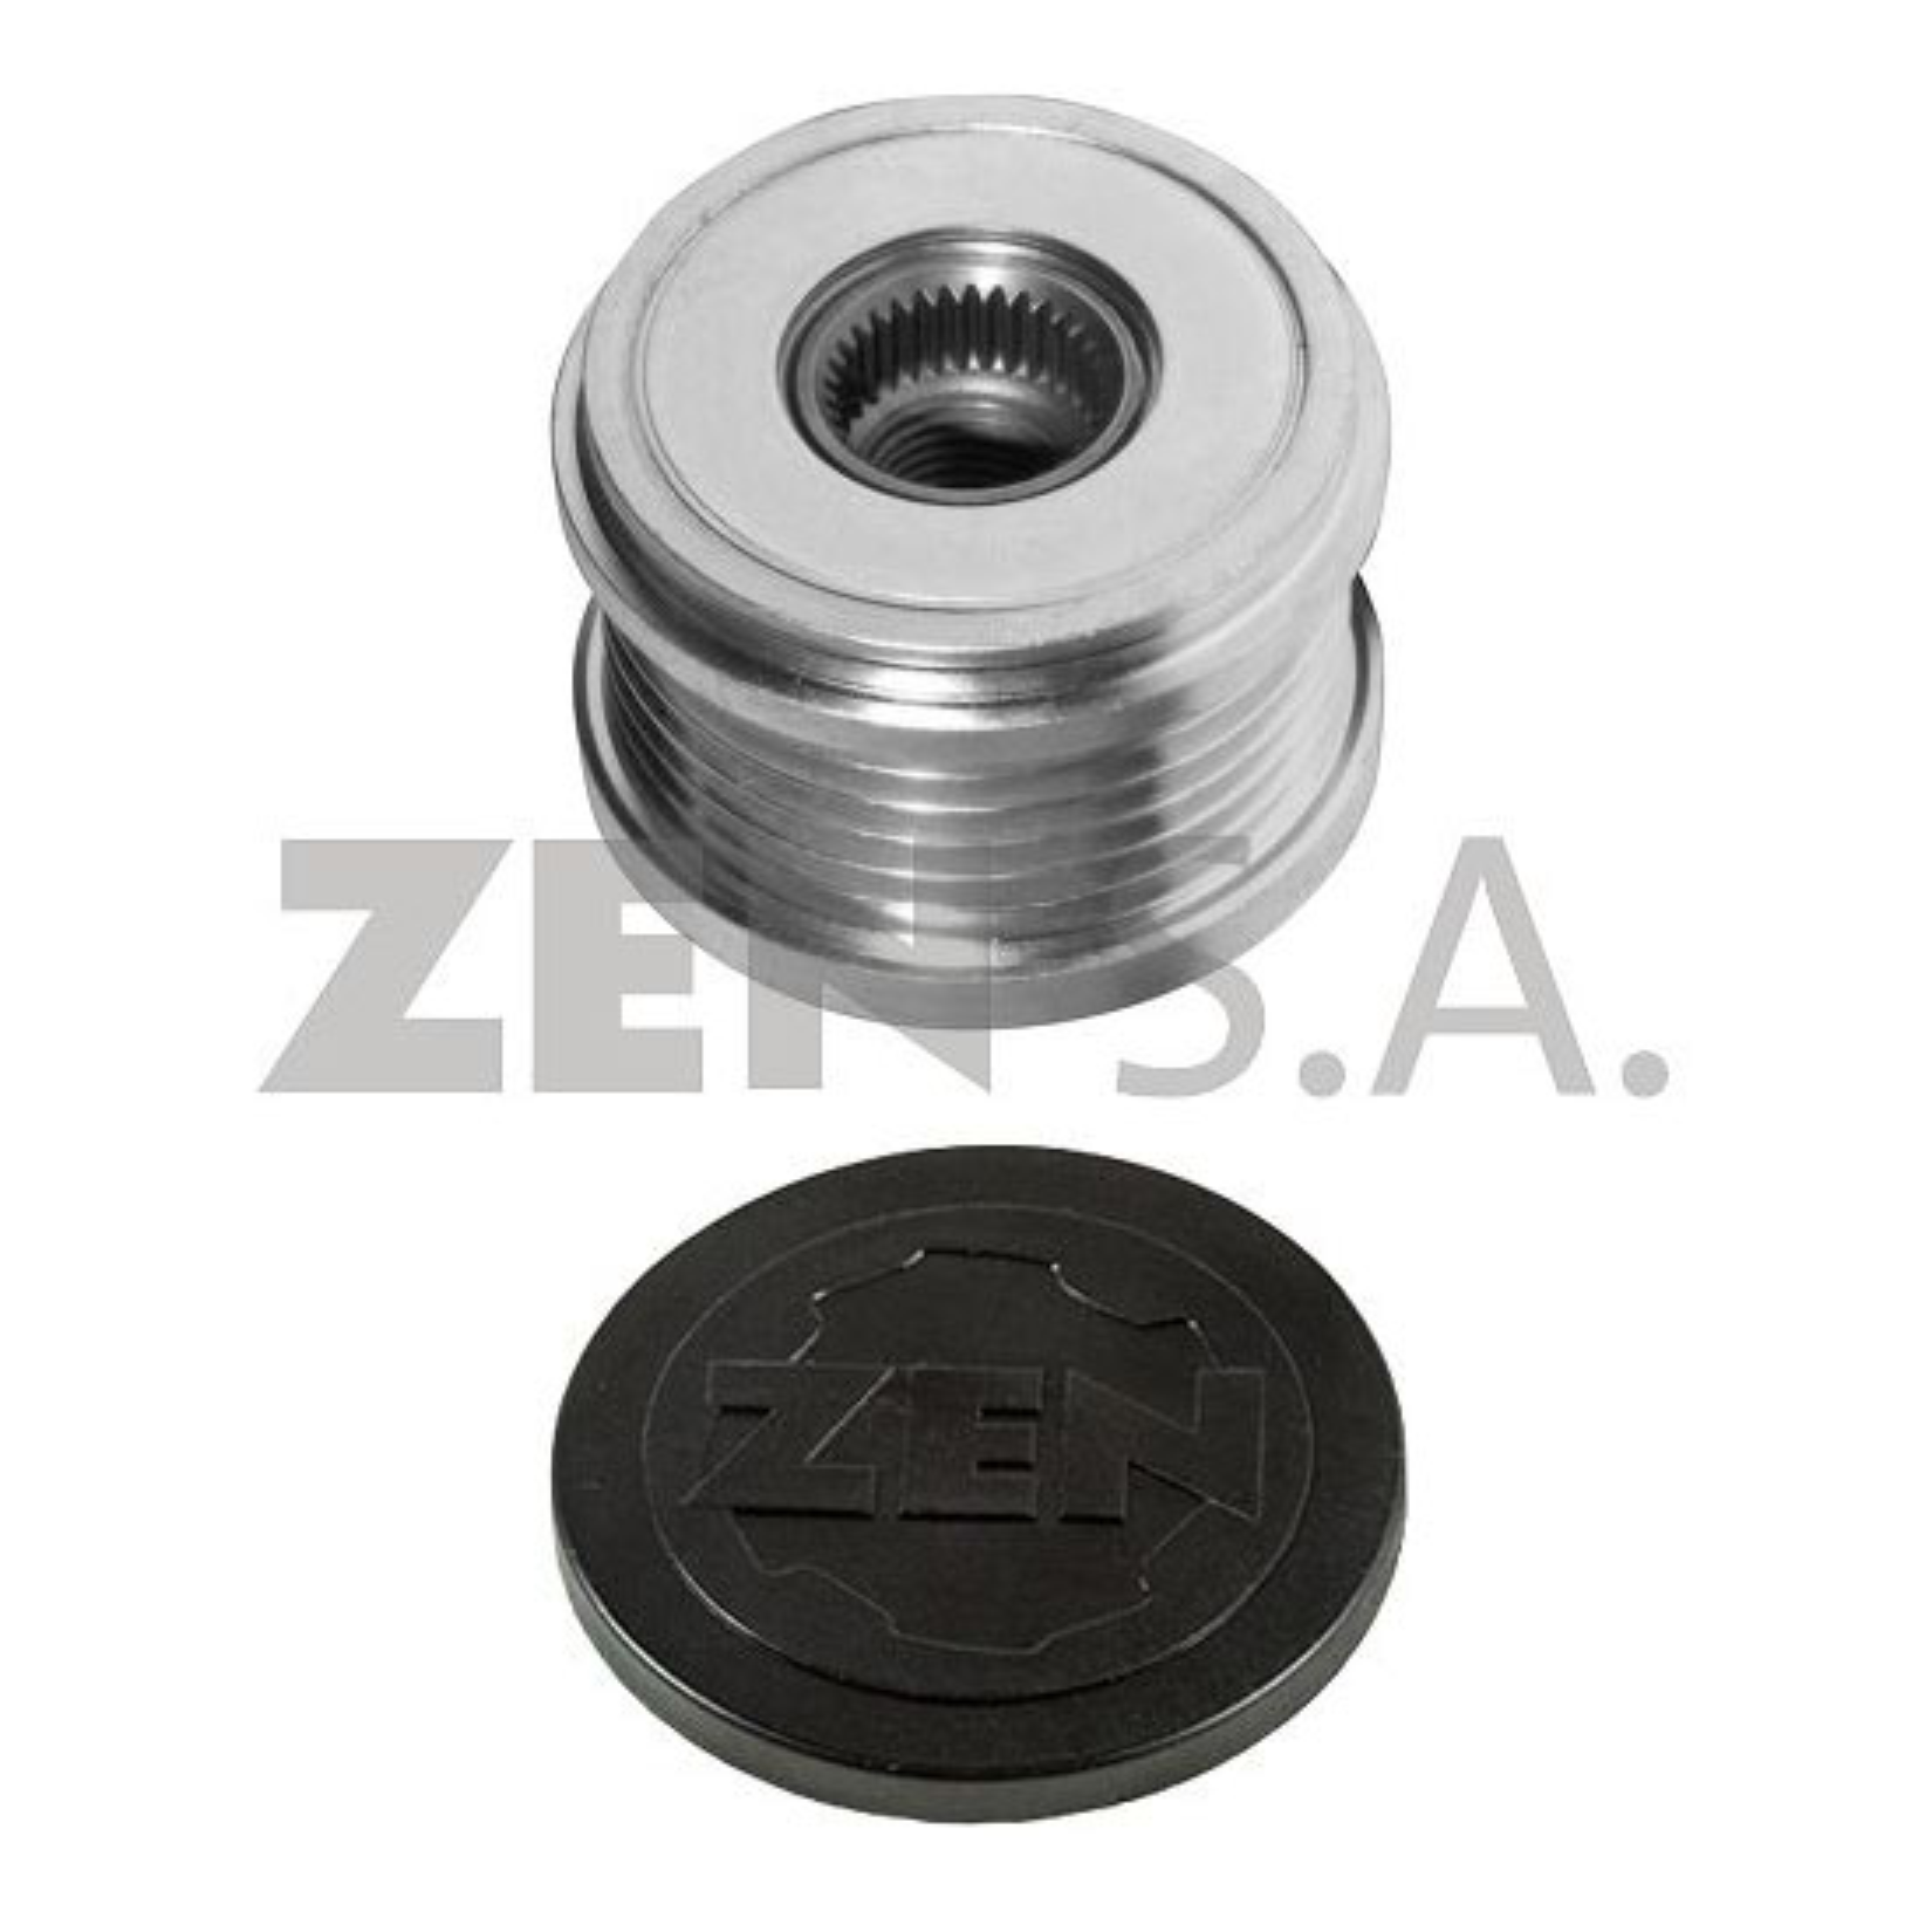 Polia Alternador Roda Livre C5 PEUGEOT 406 (ZEN5453)